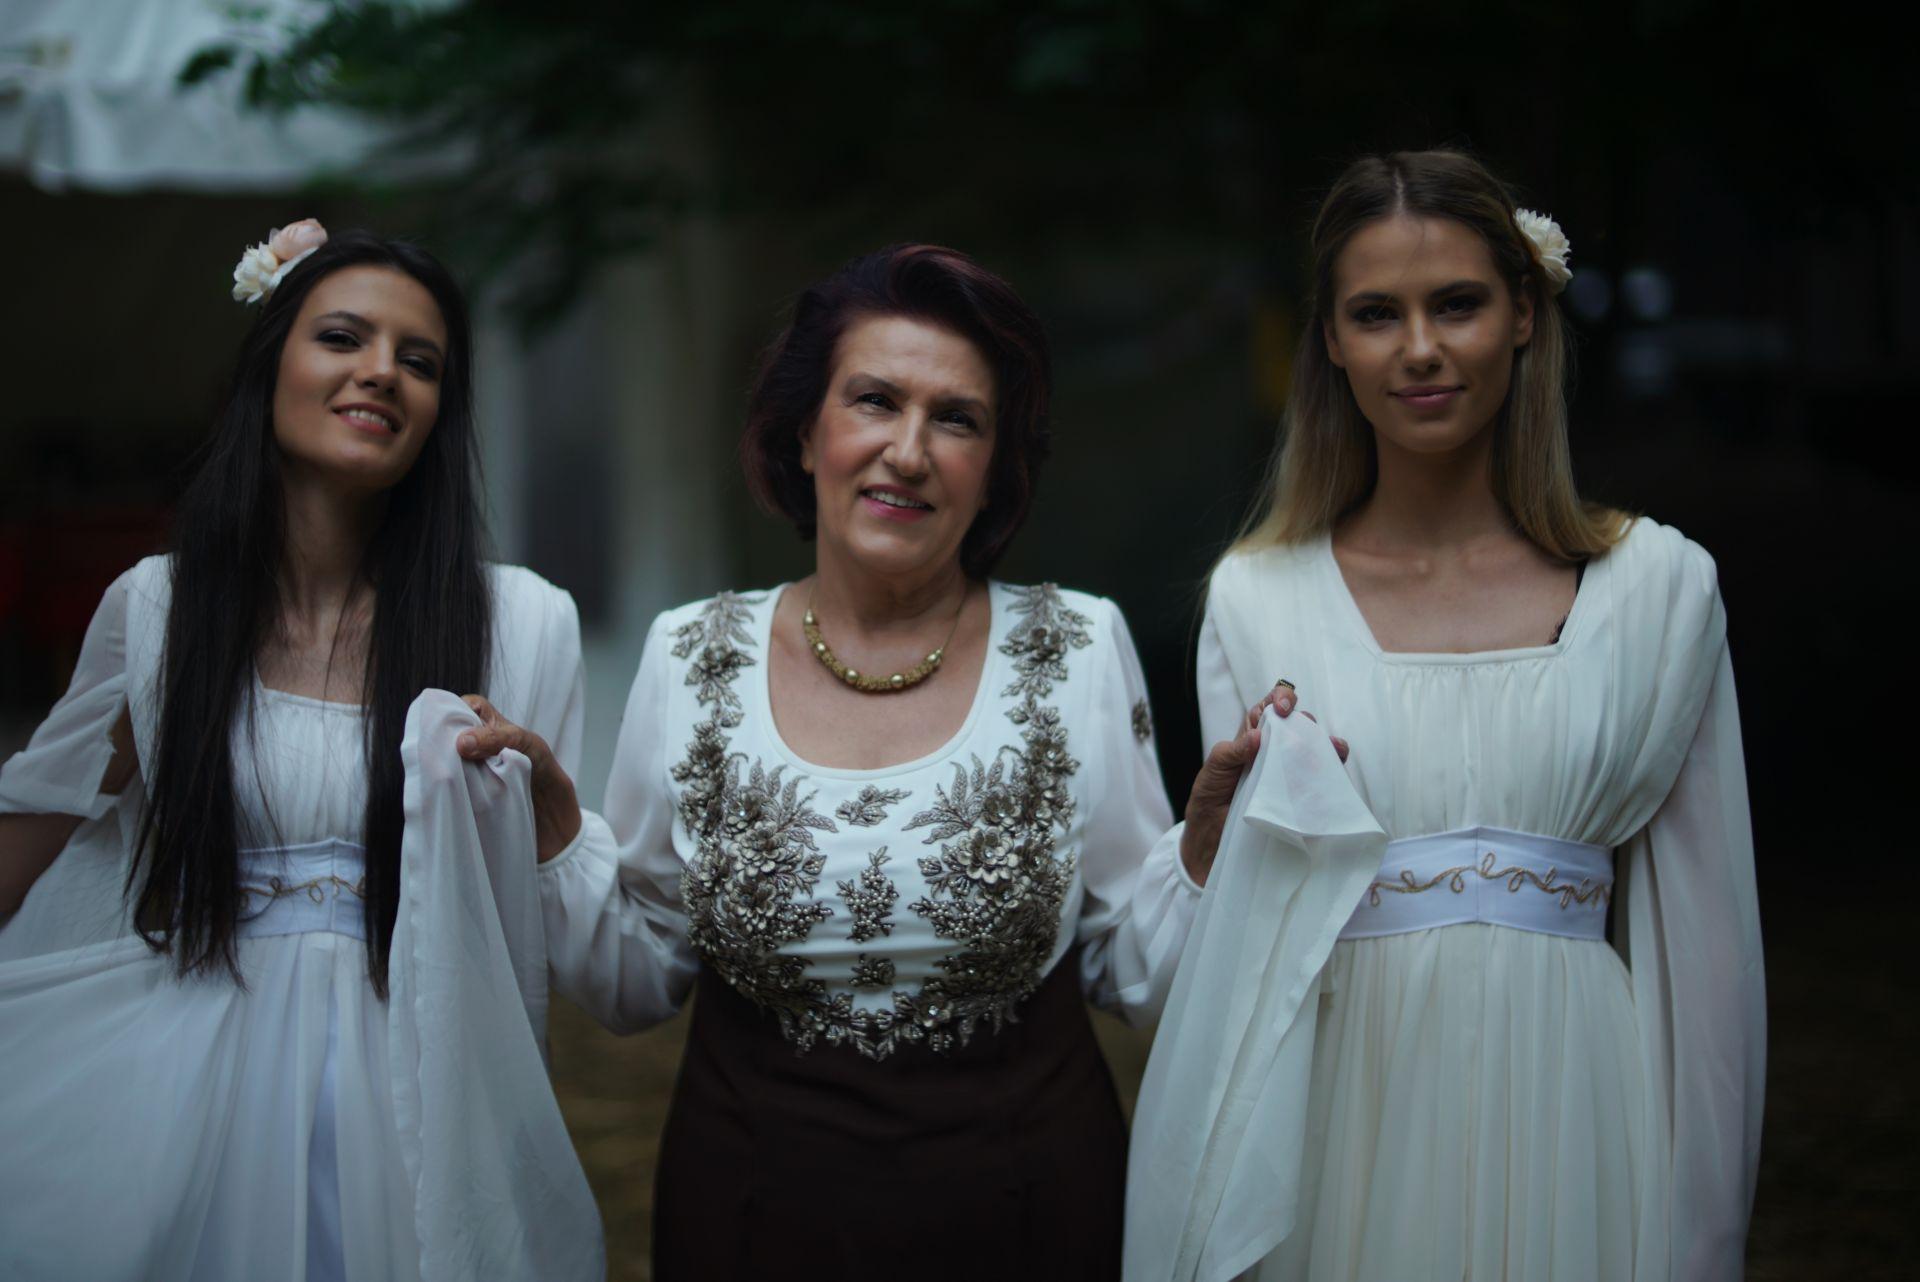 Ива и Велислава Костадинови с баба си - фолклорната певица Гуна Иванова